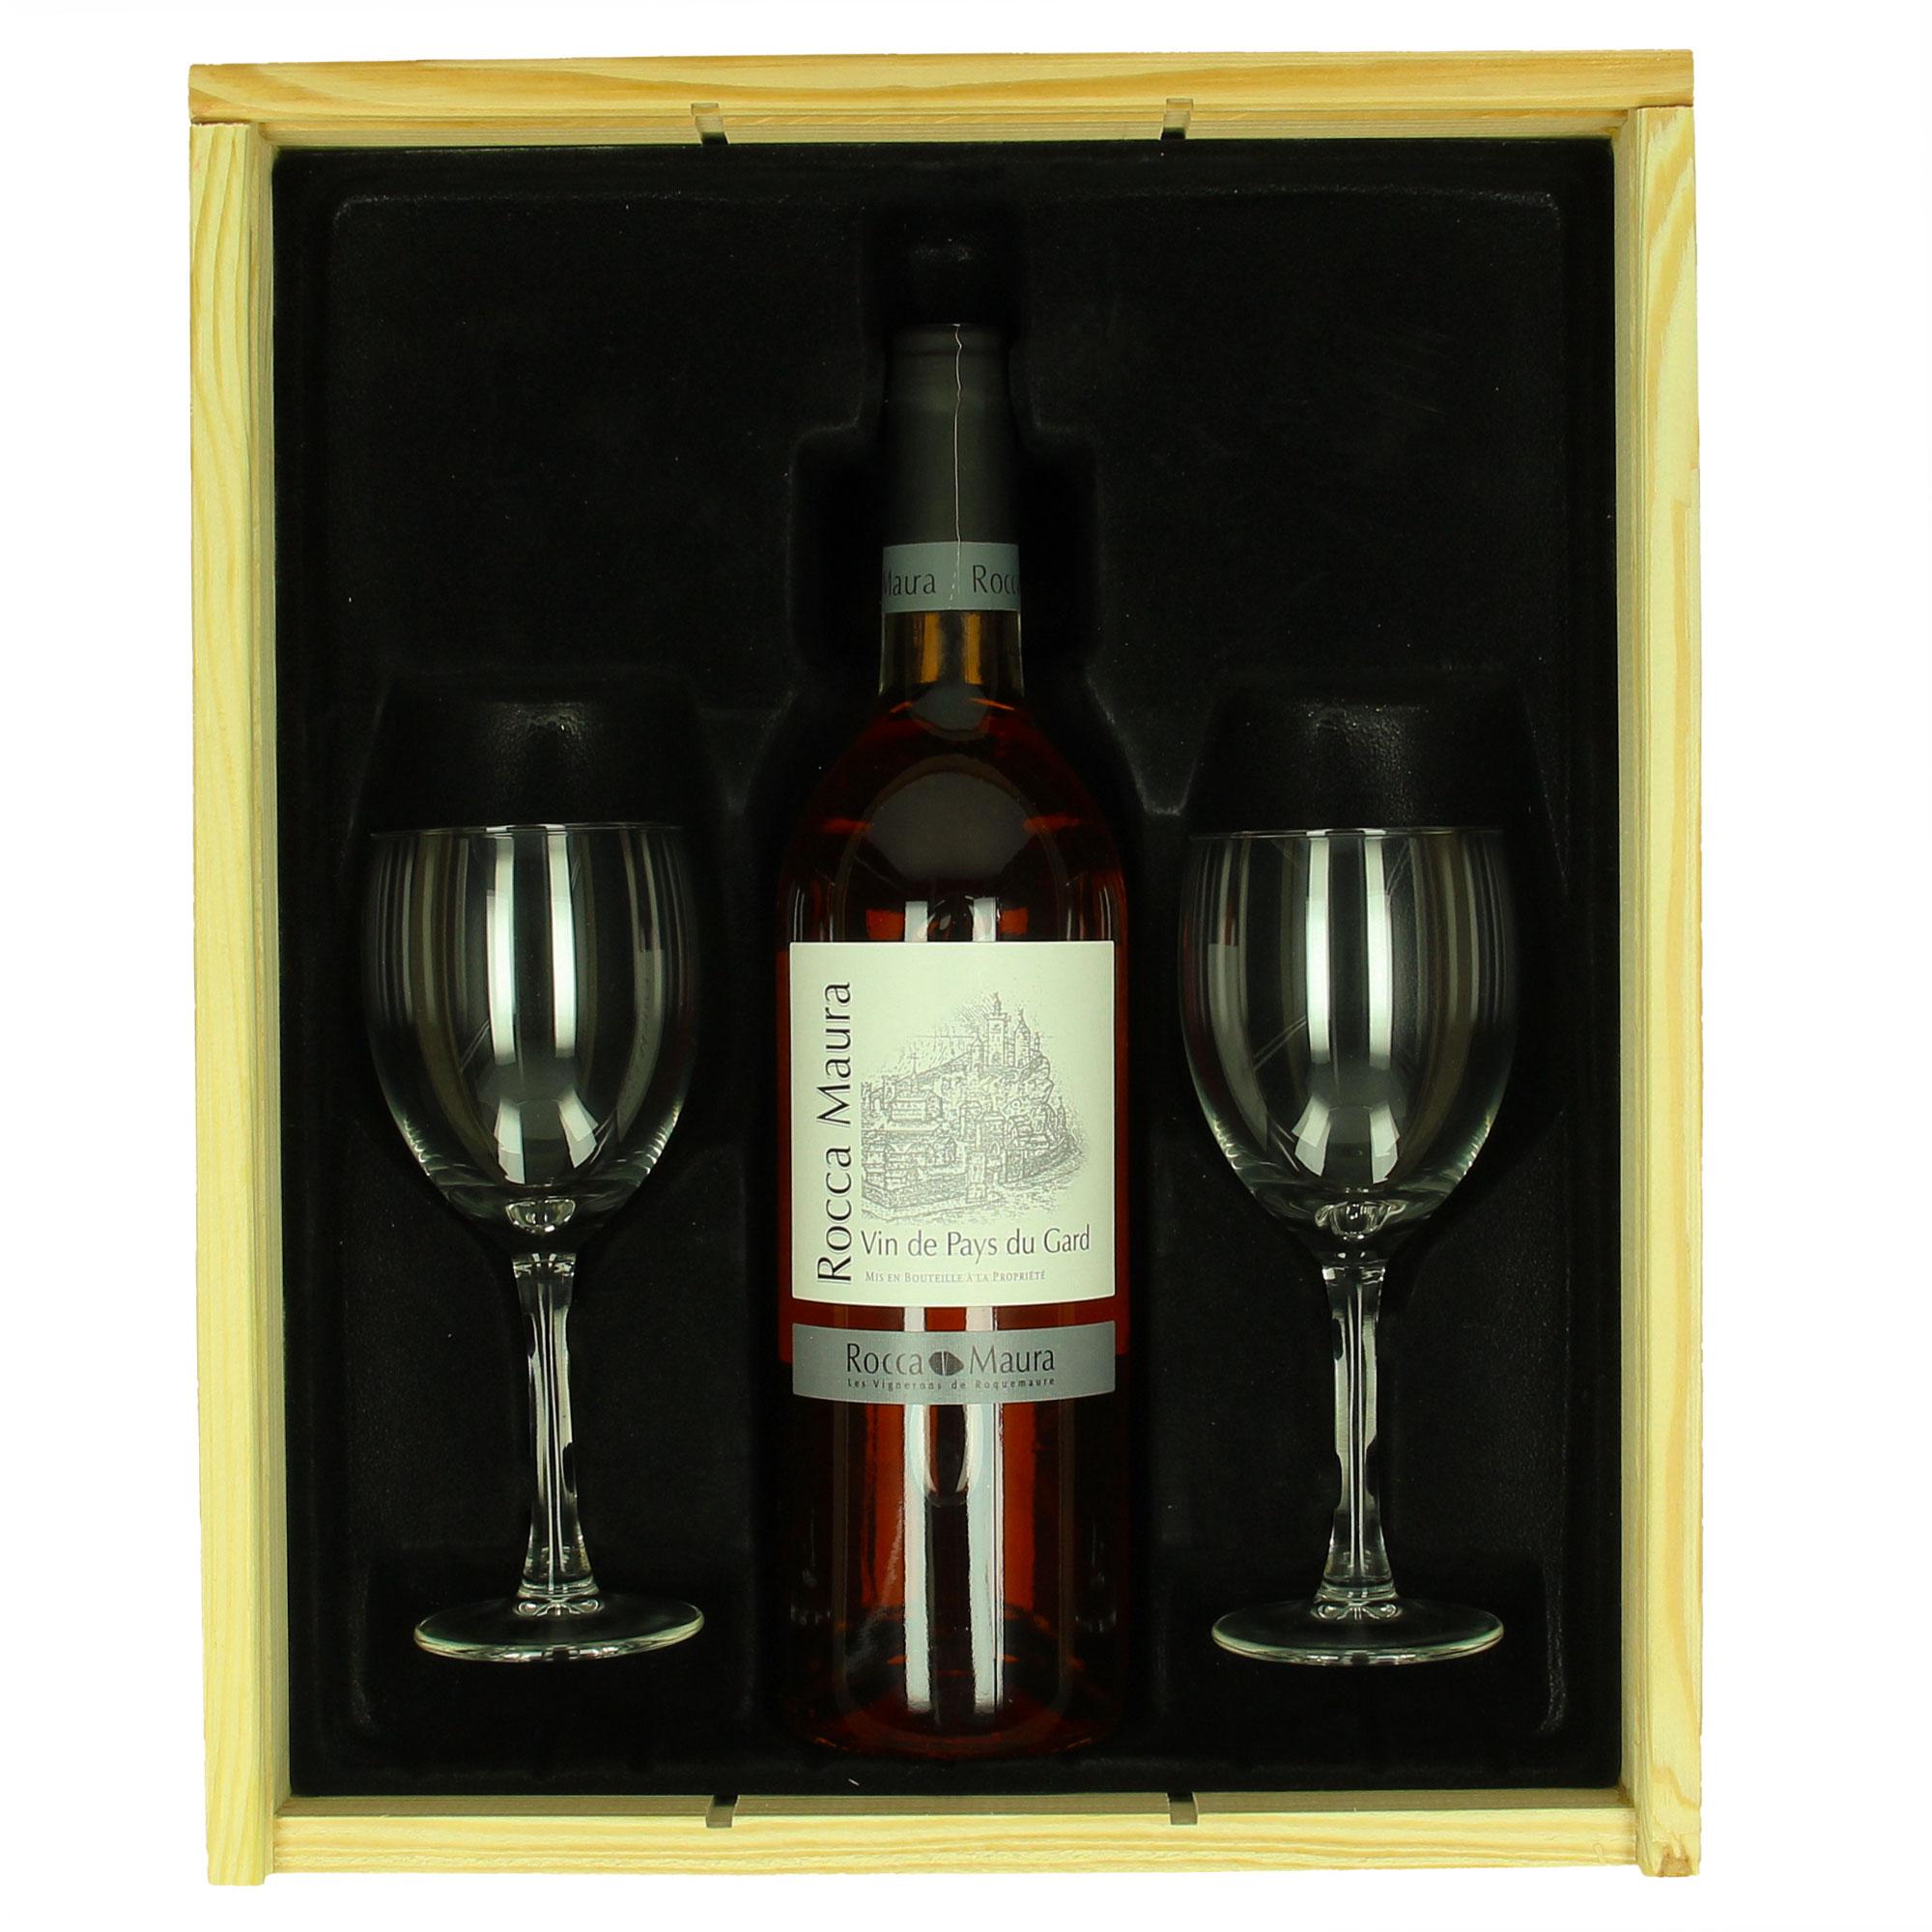 Coffret de vin Rocca Maura (rosé) + verres personnalisés